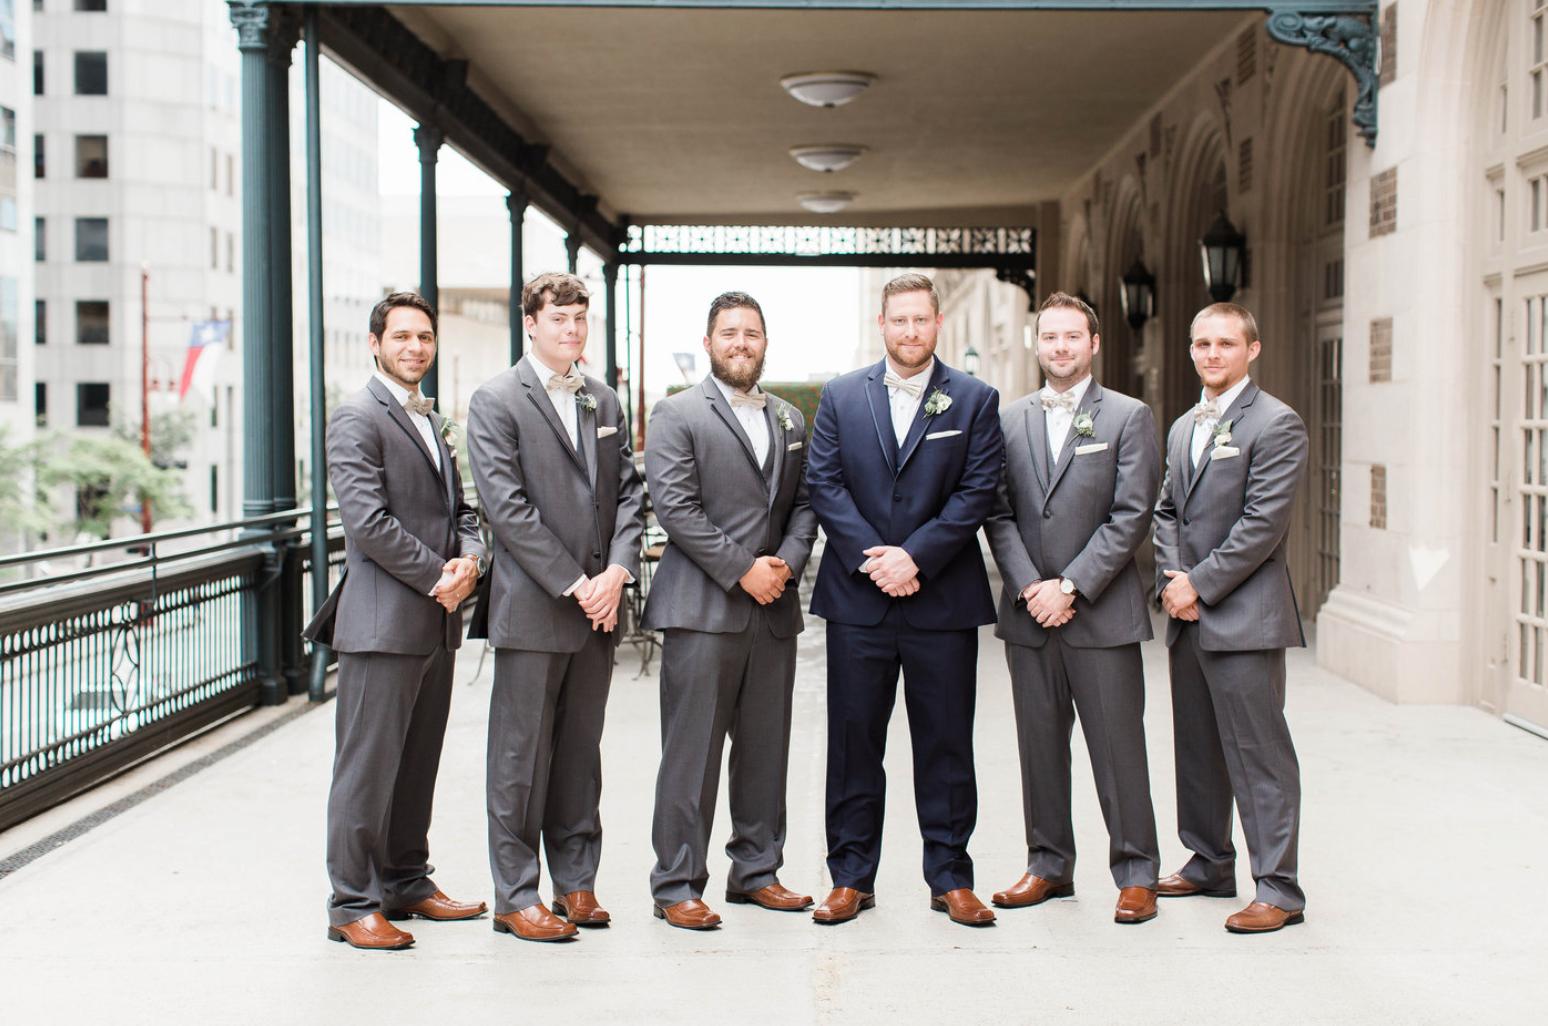 groom-groomsmen-boutonniere-navy-grey-suit-crystal-ballroom-wedding-florals-by-maxit-flower-design-in-houston-texas